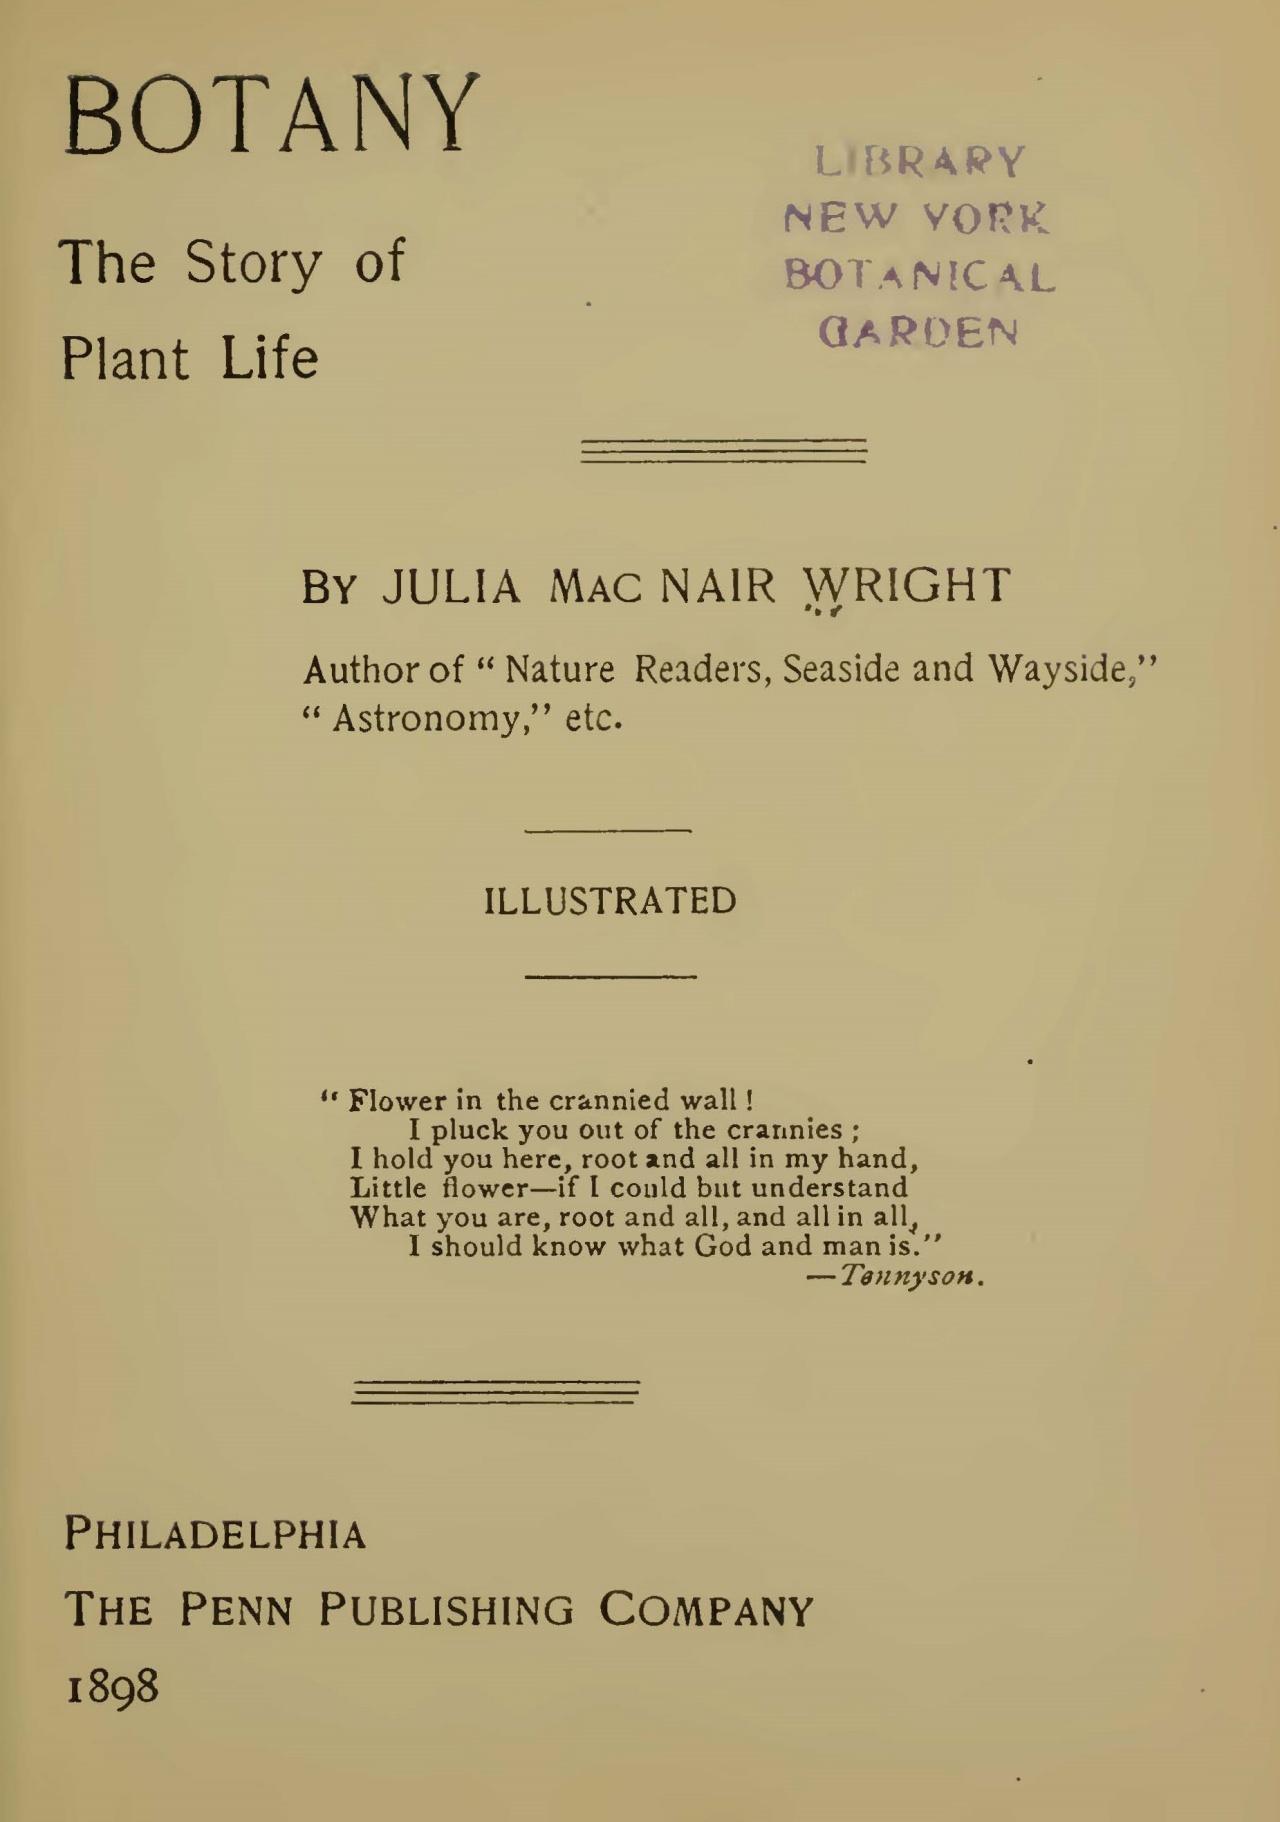 Wright, Julia McNair, Botany Title Page.jpg